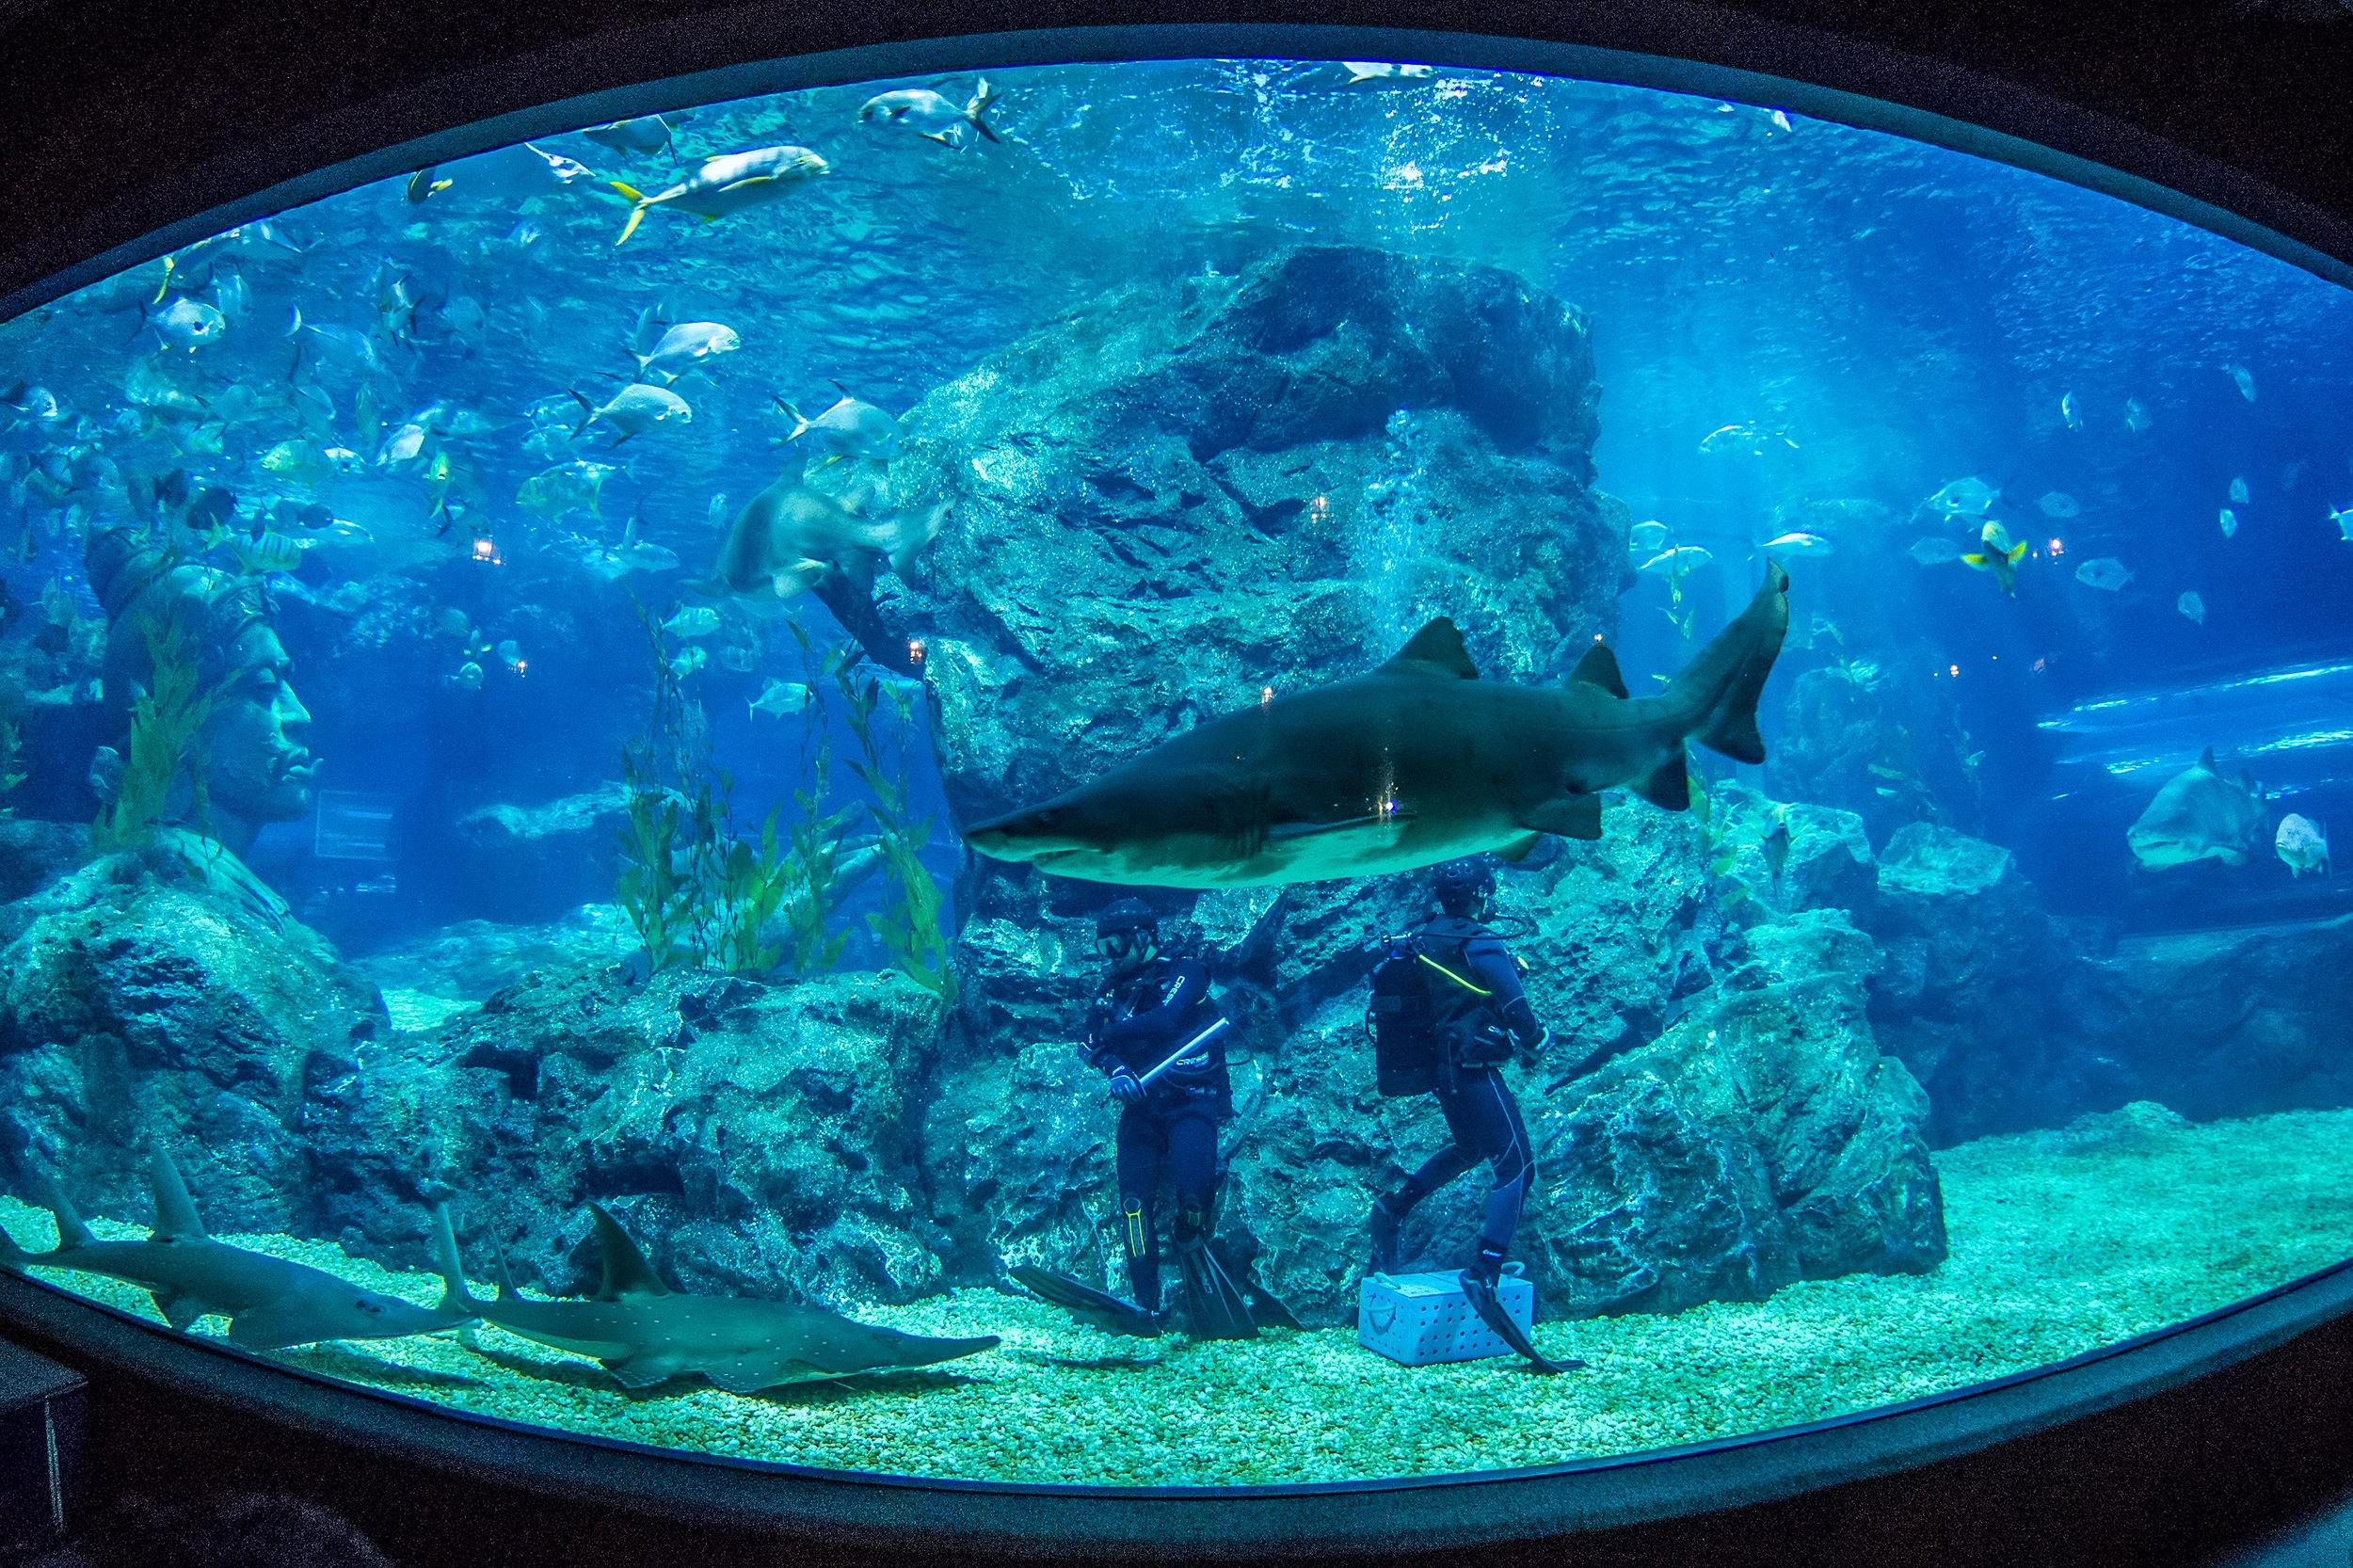 曼谷暹羅海洋世界  Sea Life Bangkok Ocean World   -3